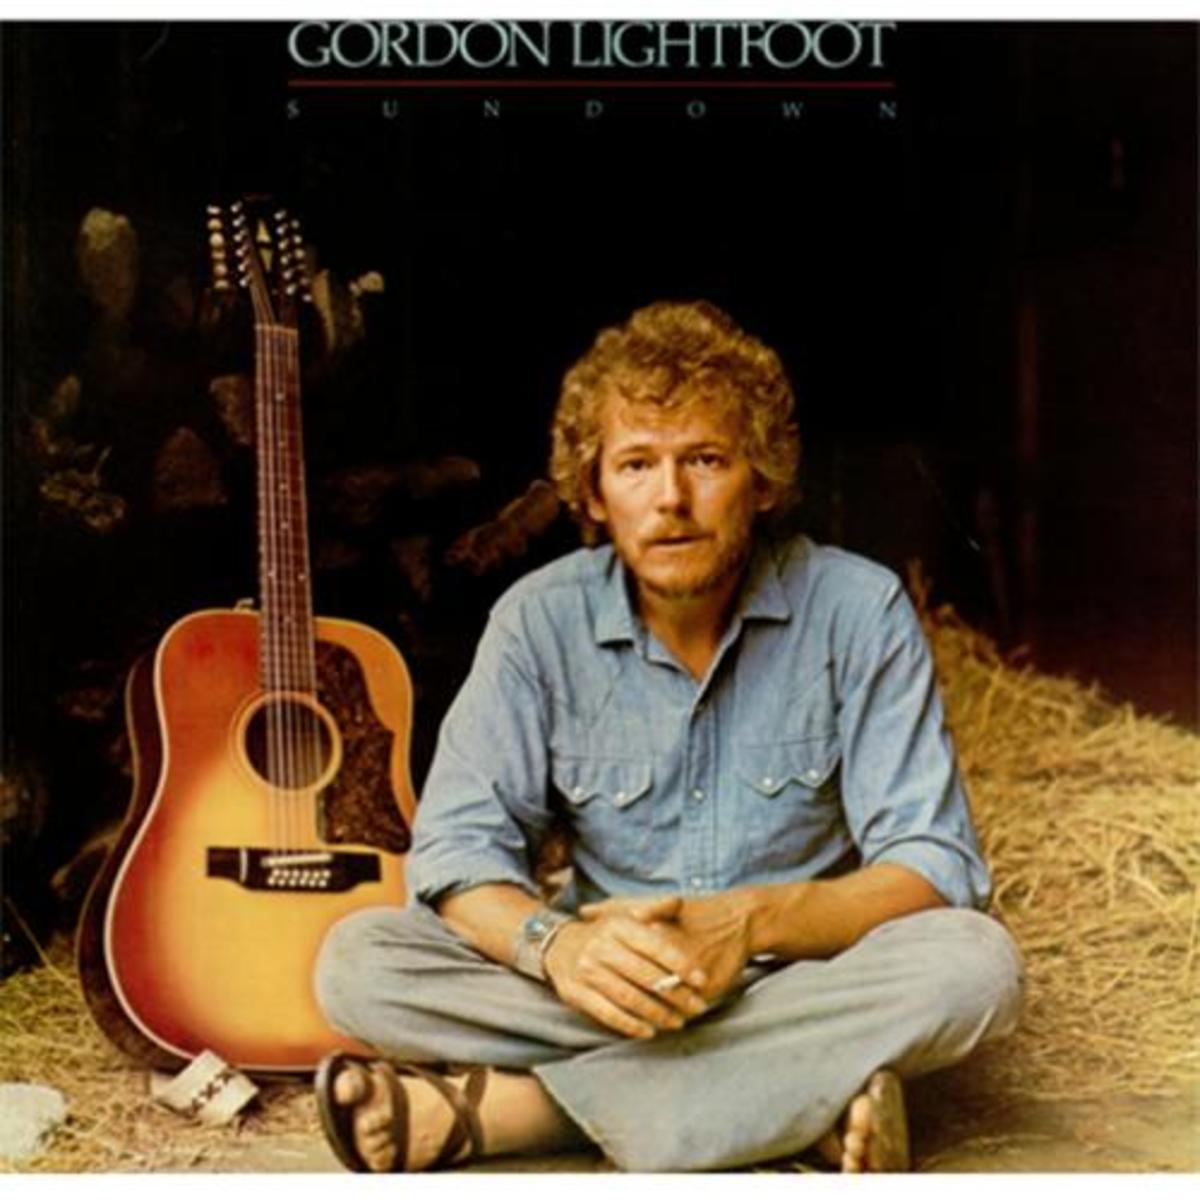 Gordon Lightfoot, Guitars and Songwriting.